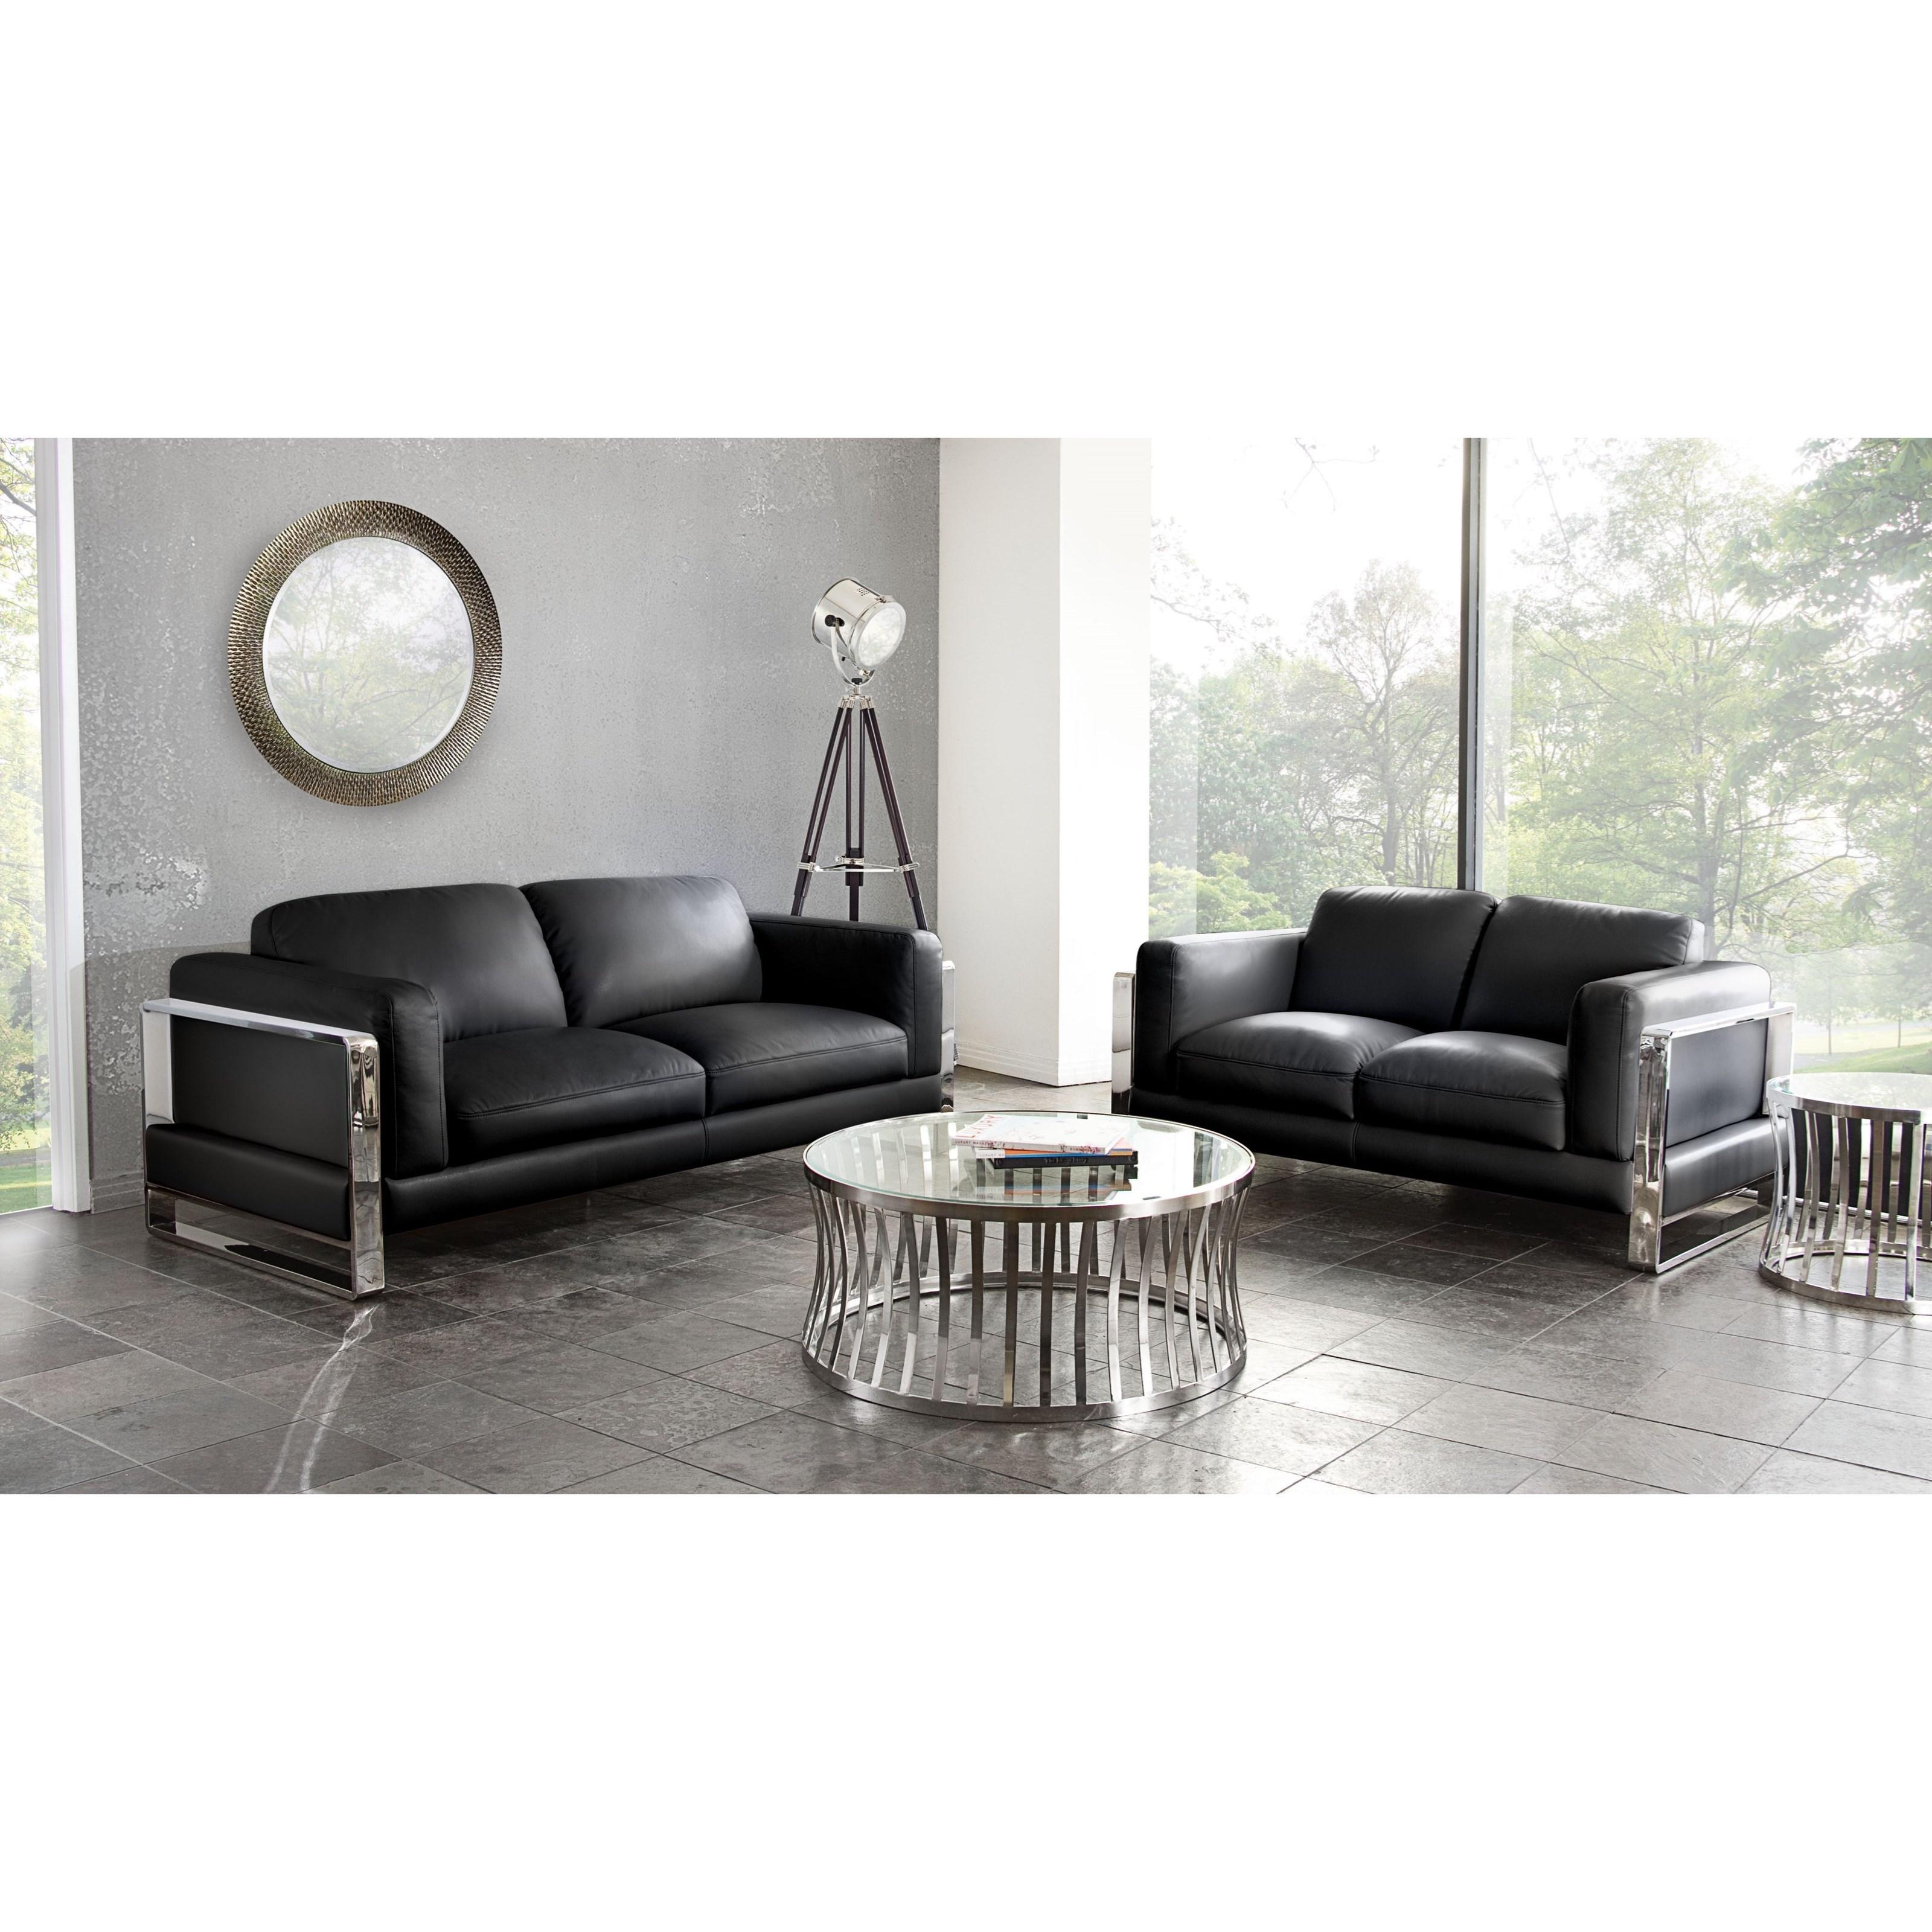 Diamond Sofa Annika Annikaslbl Sofa And Loveseat Set With Polished Stainless Steel Arm Del Sol